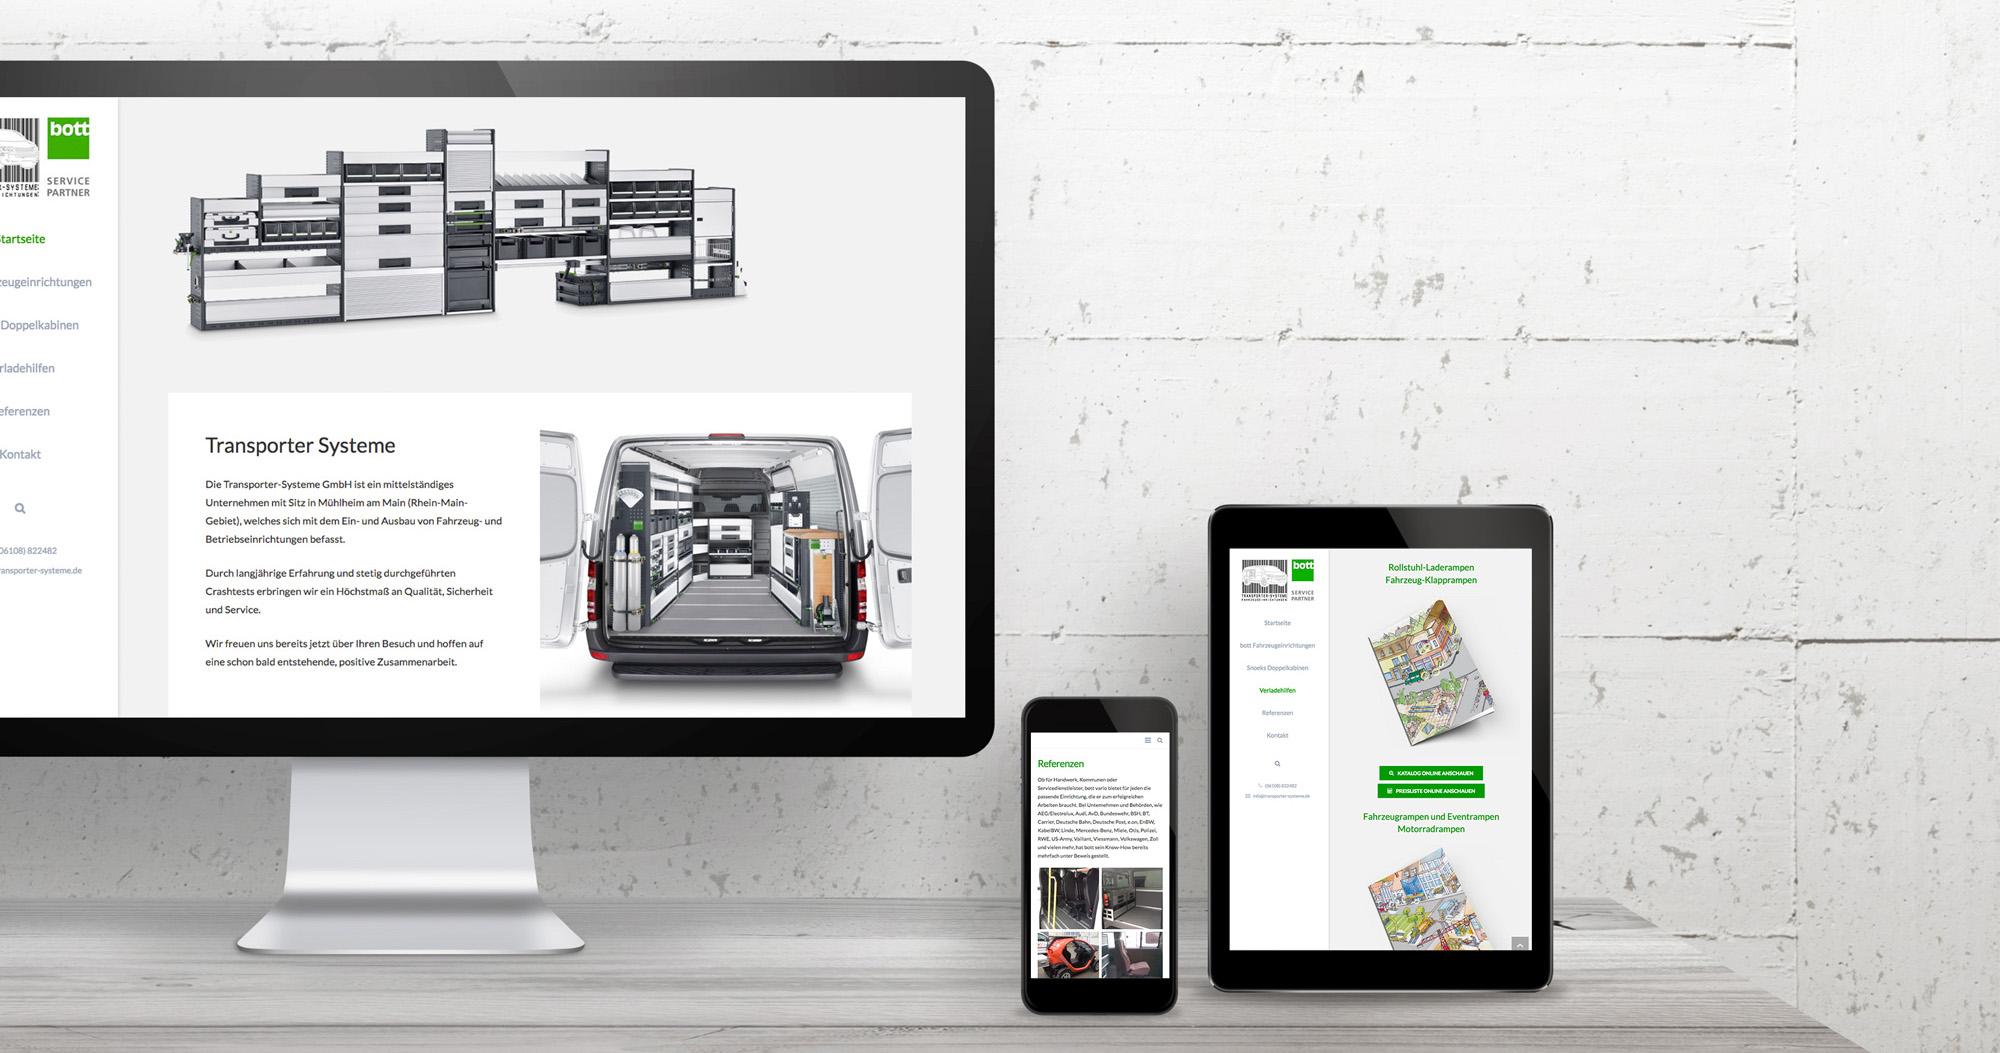 Transporter-Systeme GmbH